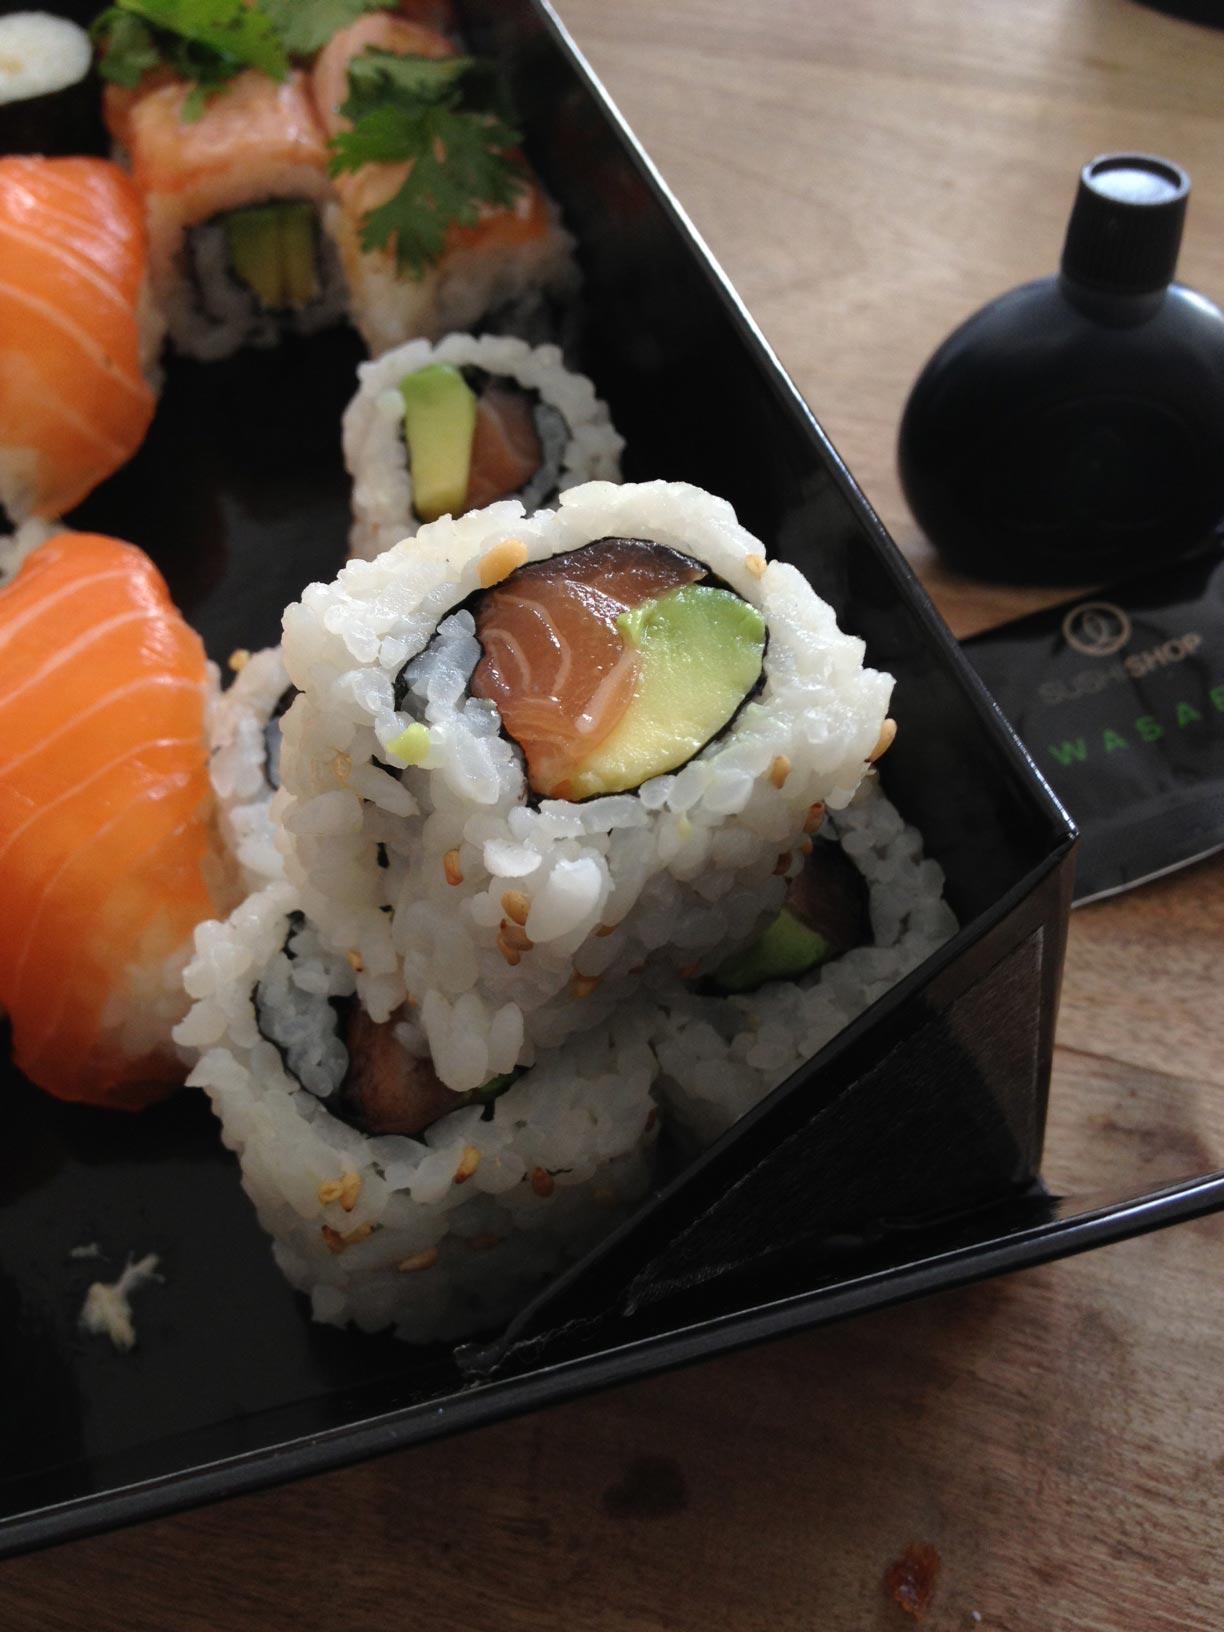 sushi shop rueil malmaison miki sushi japonais rue maurice thorez nanterre restaurant avis. Black Bedroom Furniture Sets. Home Design Ideas